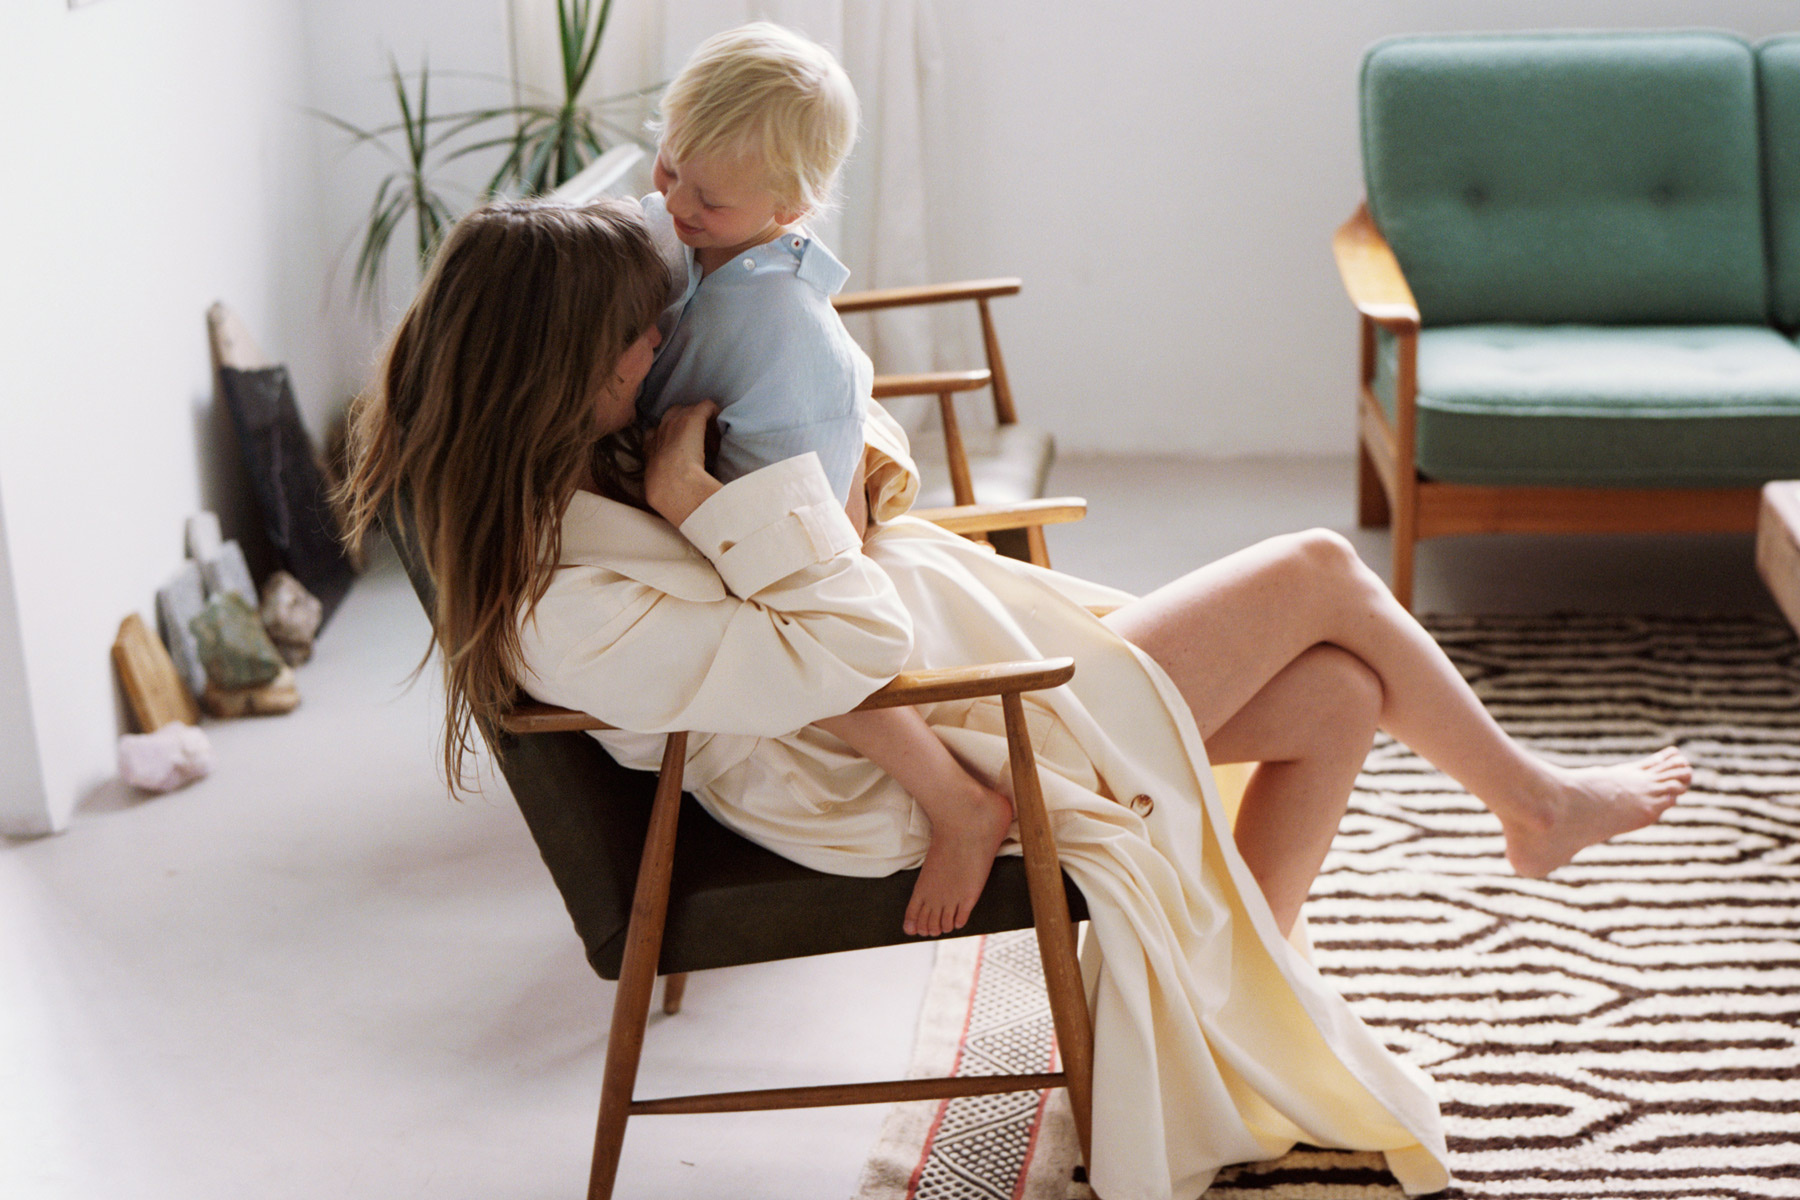 mommy_cool_ida_johansson_directora_arte_122237141_1800x1200.jpg